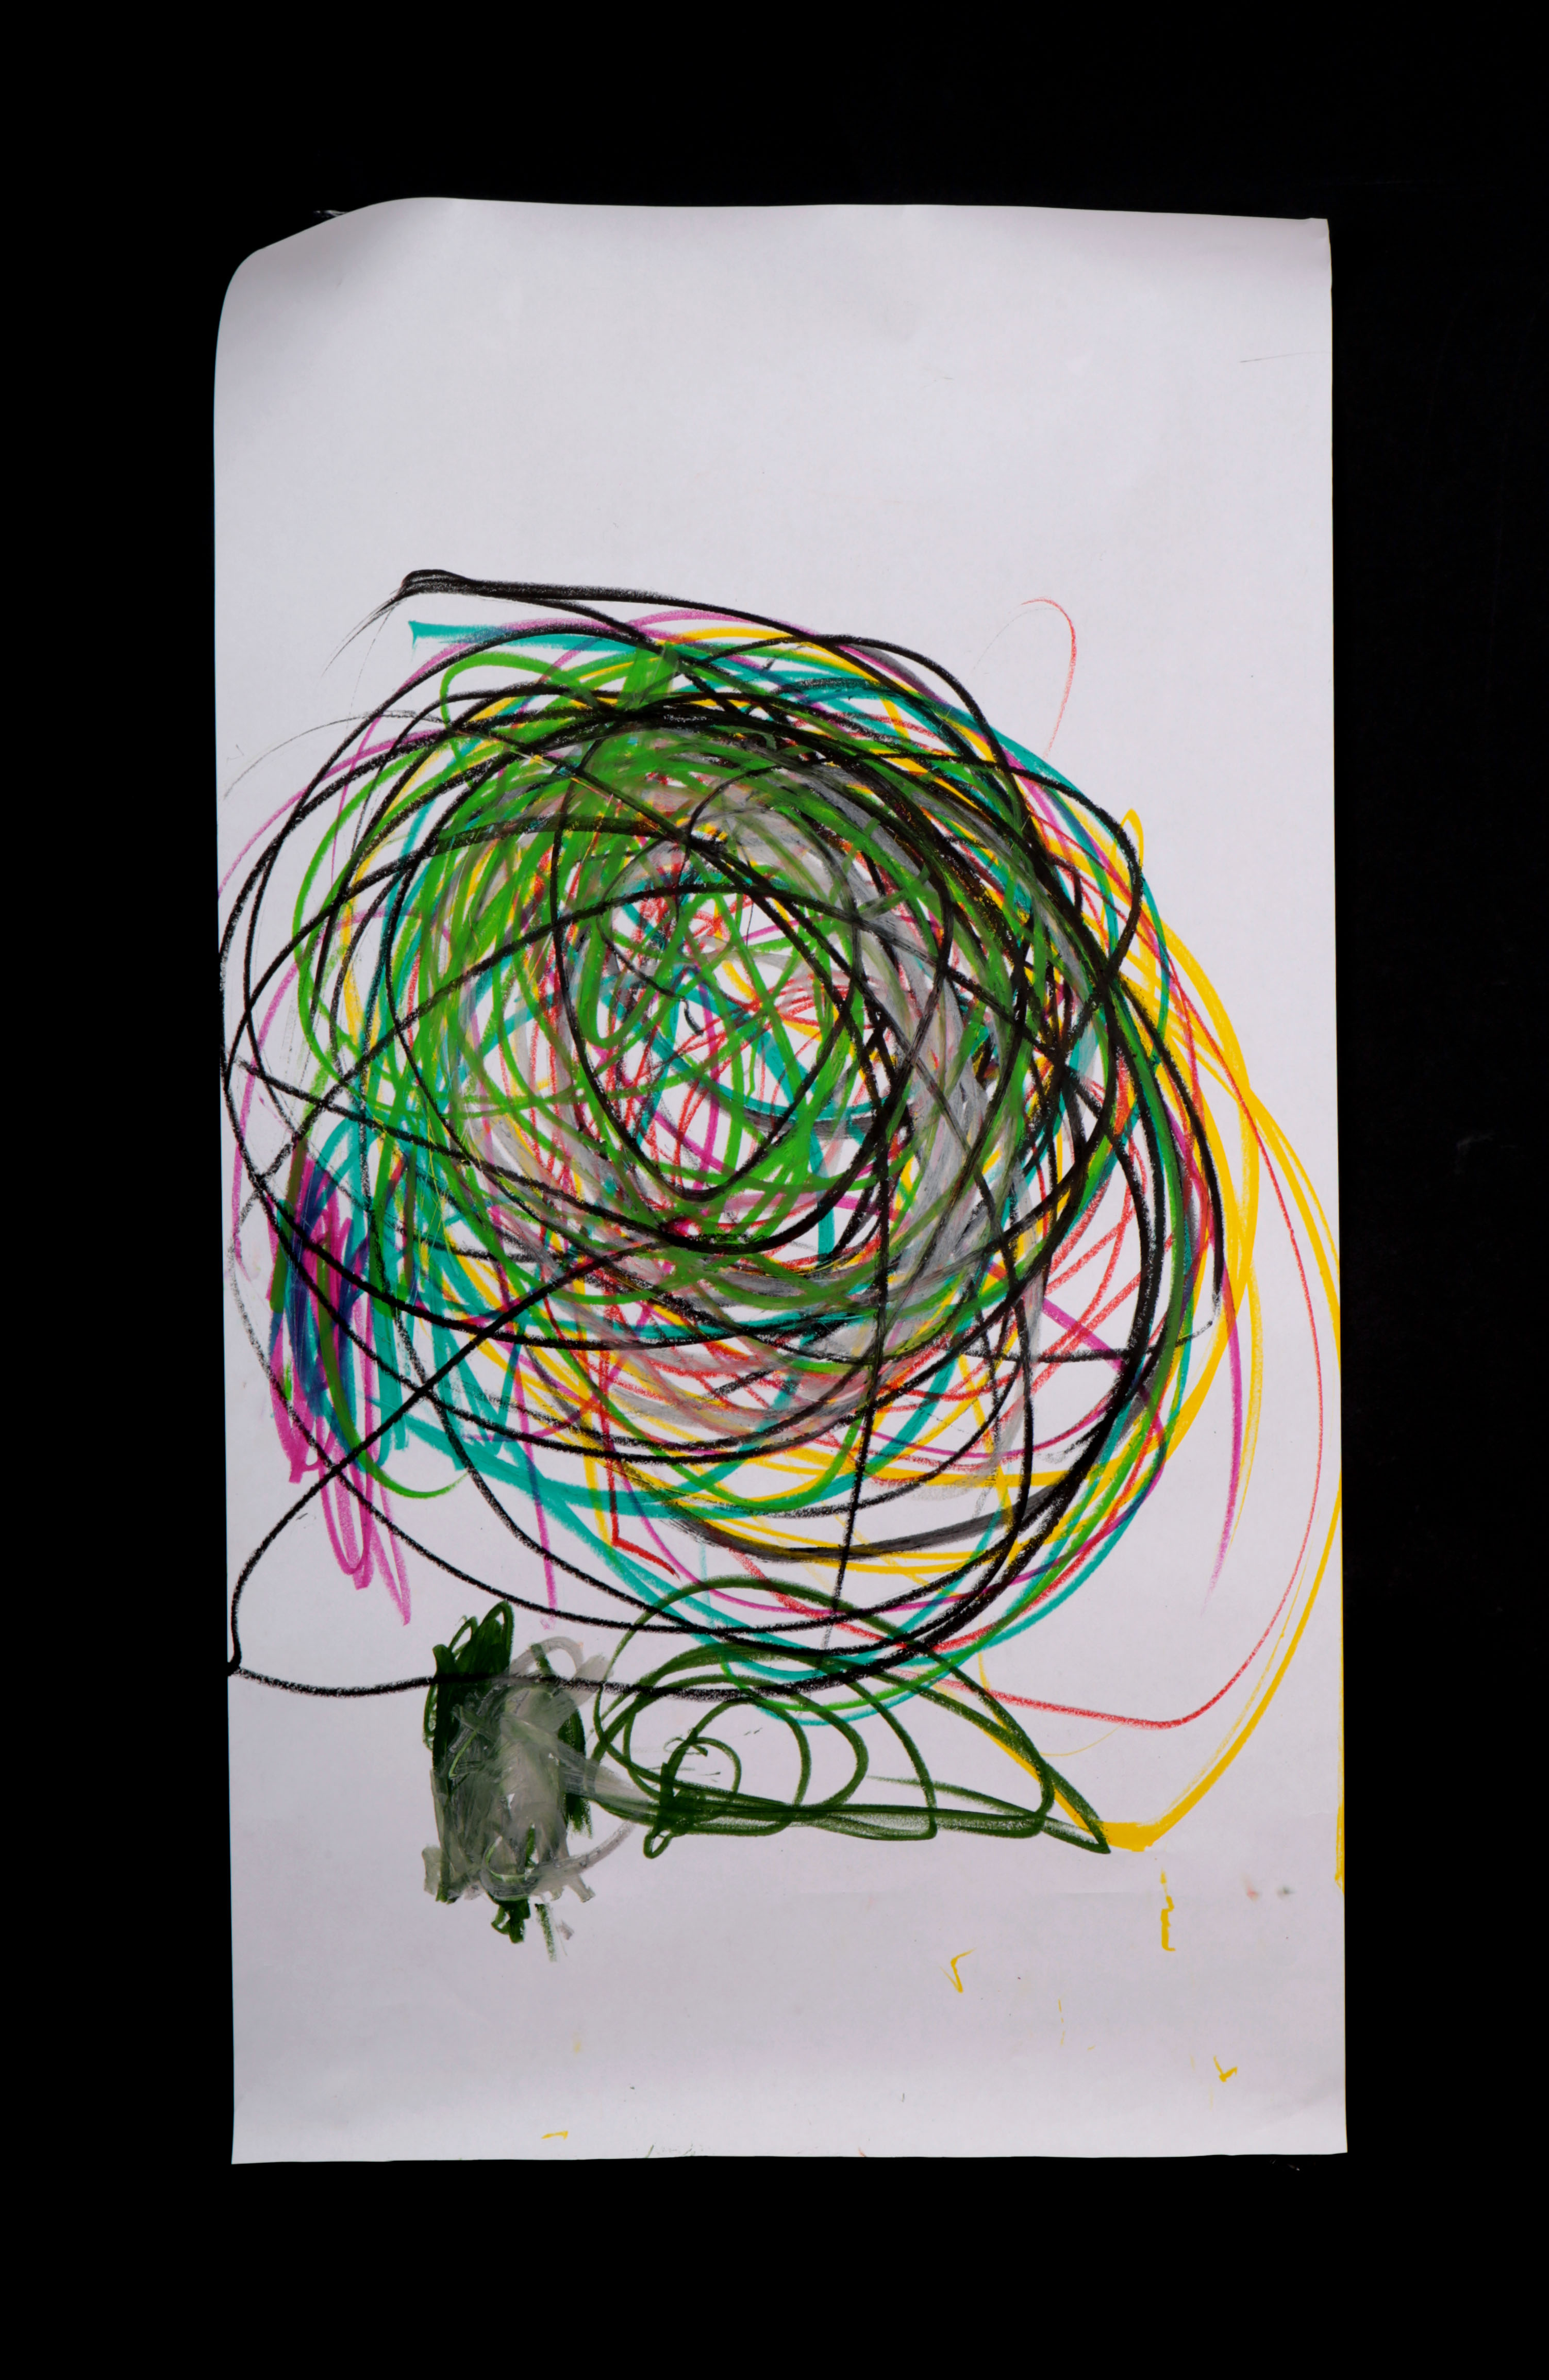 Art by Anastasia. Untitled #77. Gel sticks on paper.